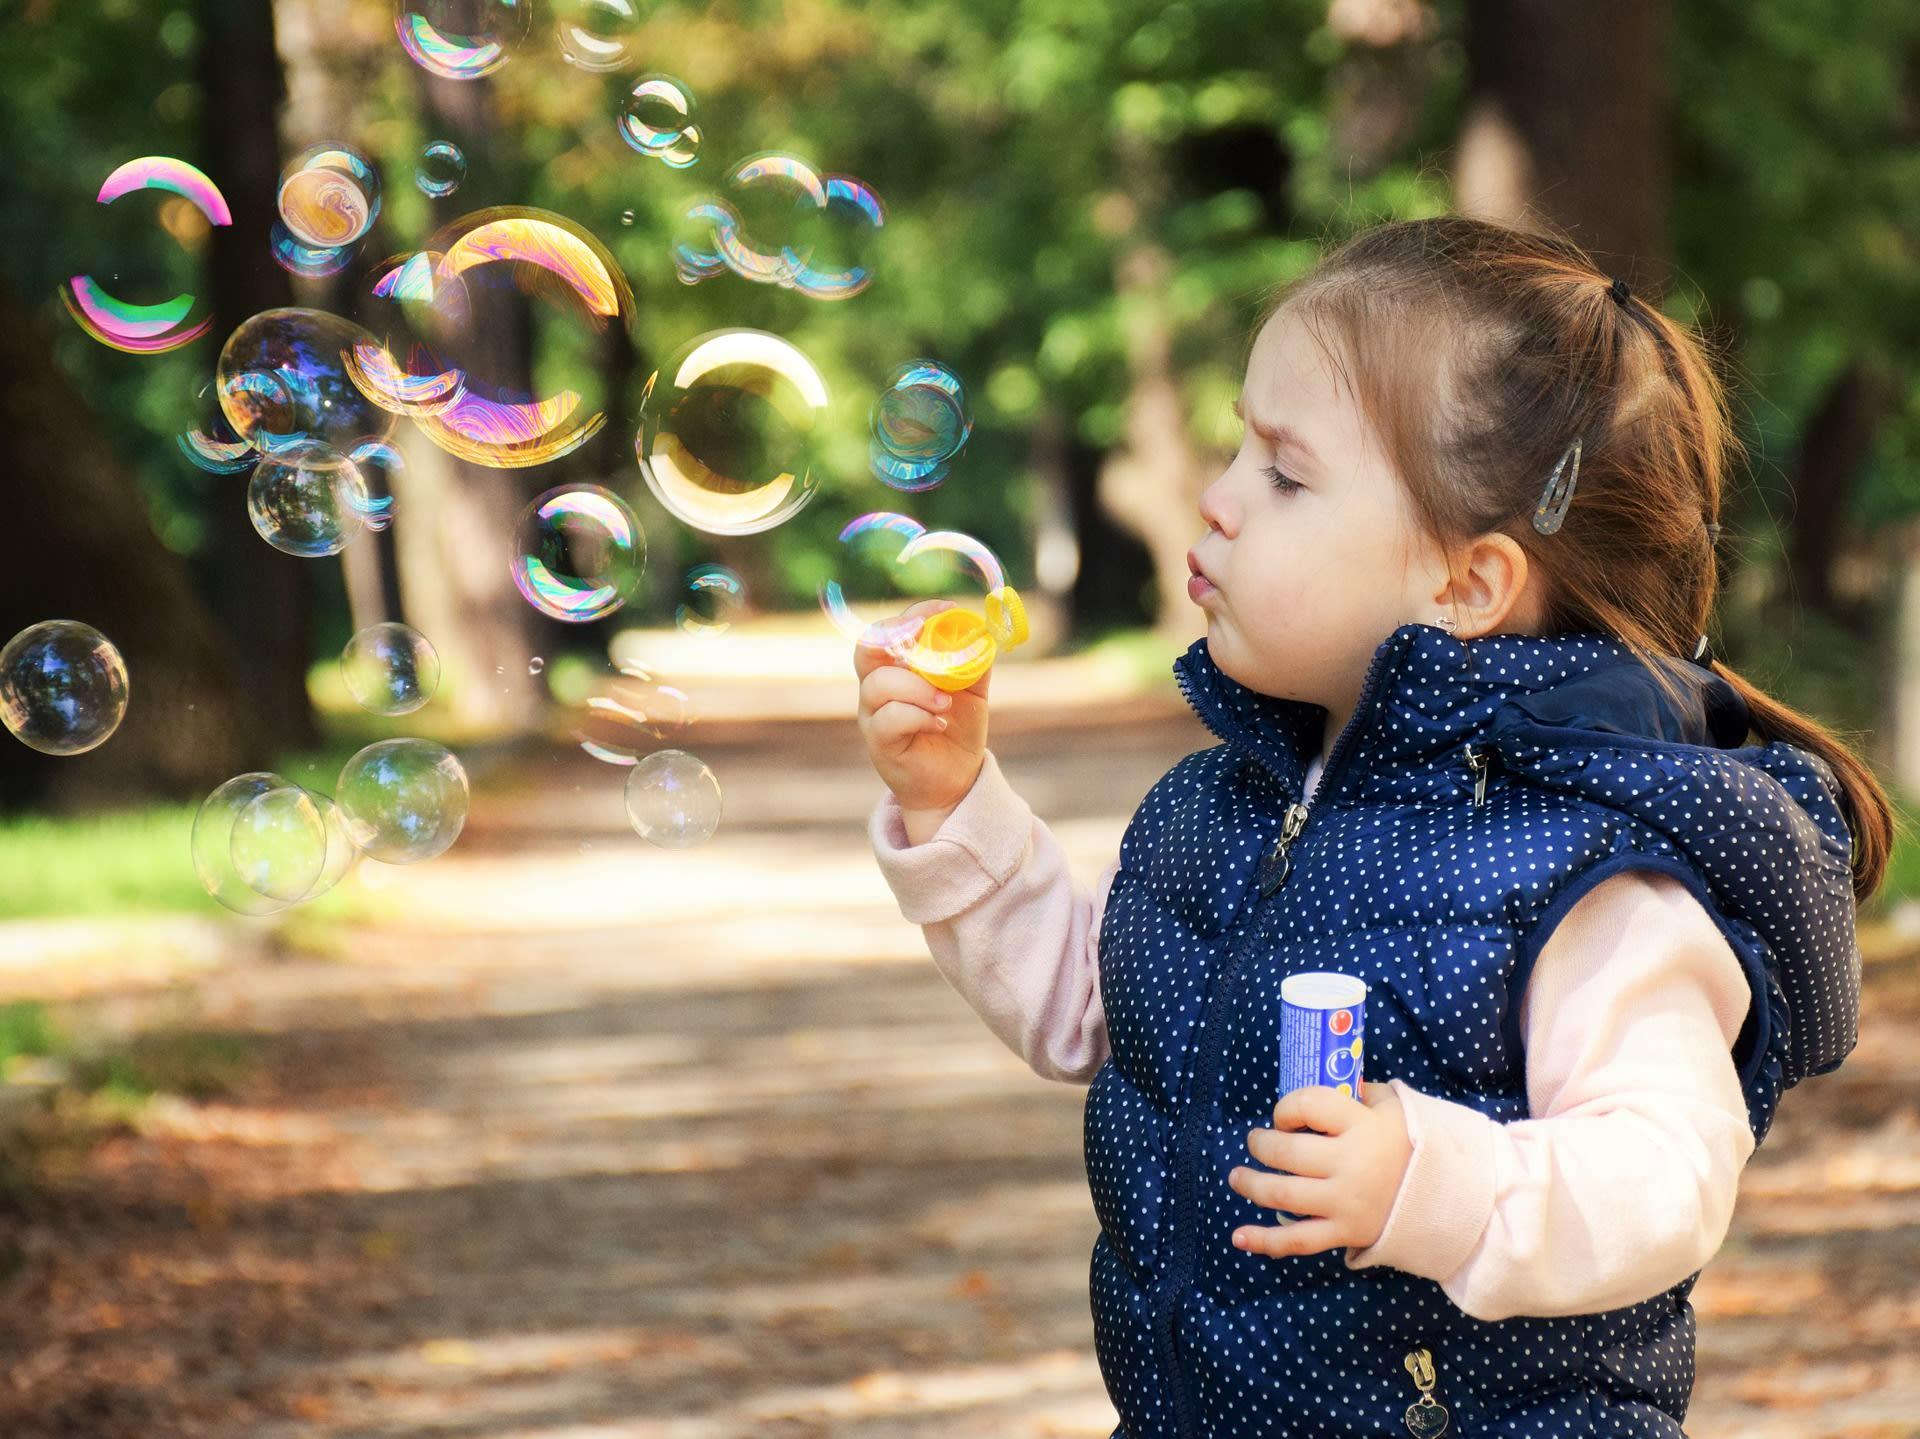 girl playing soap balloons